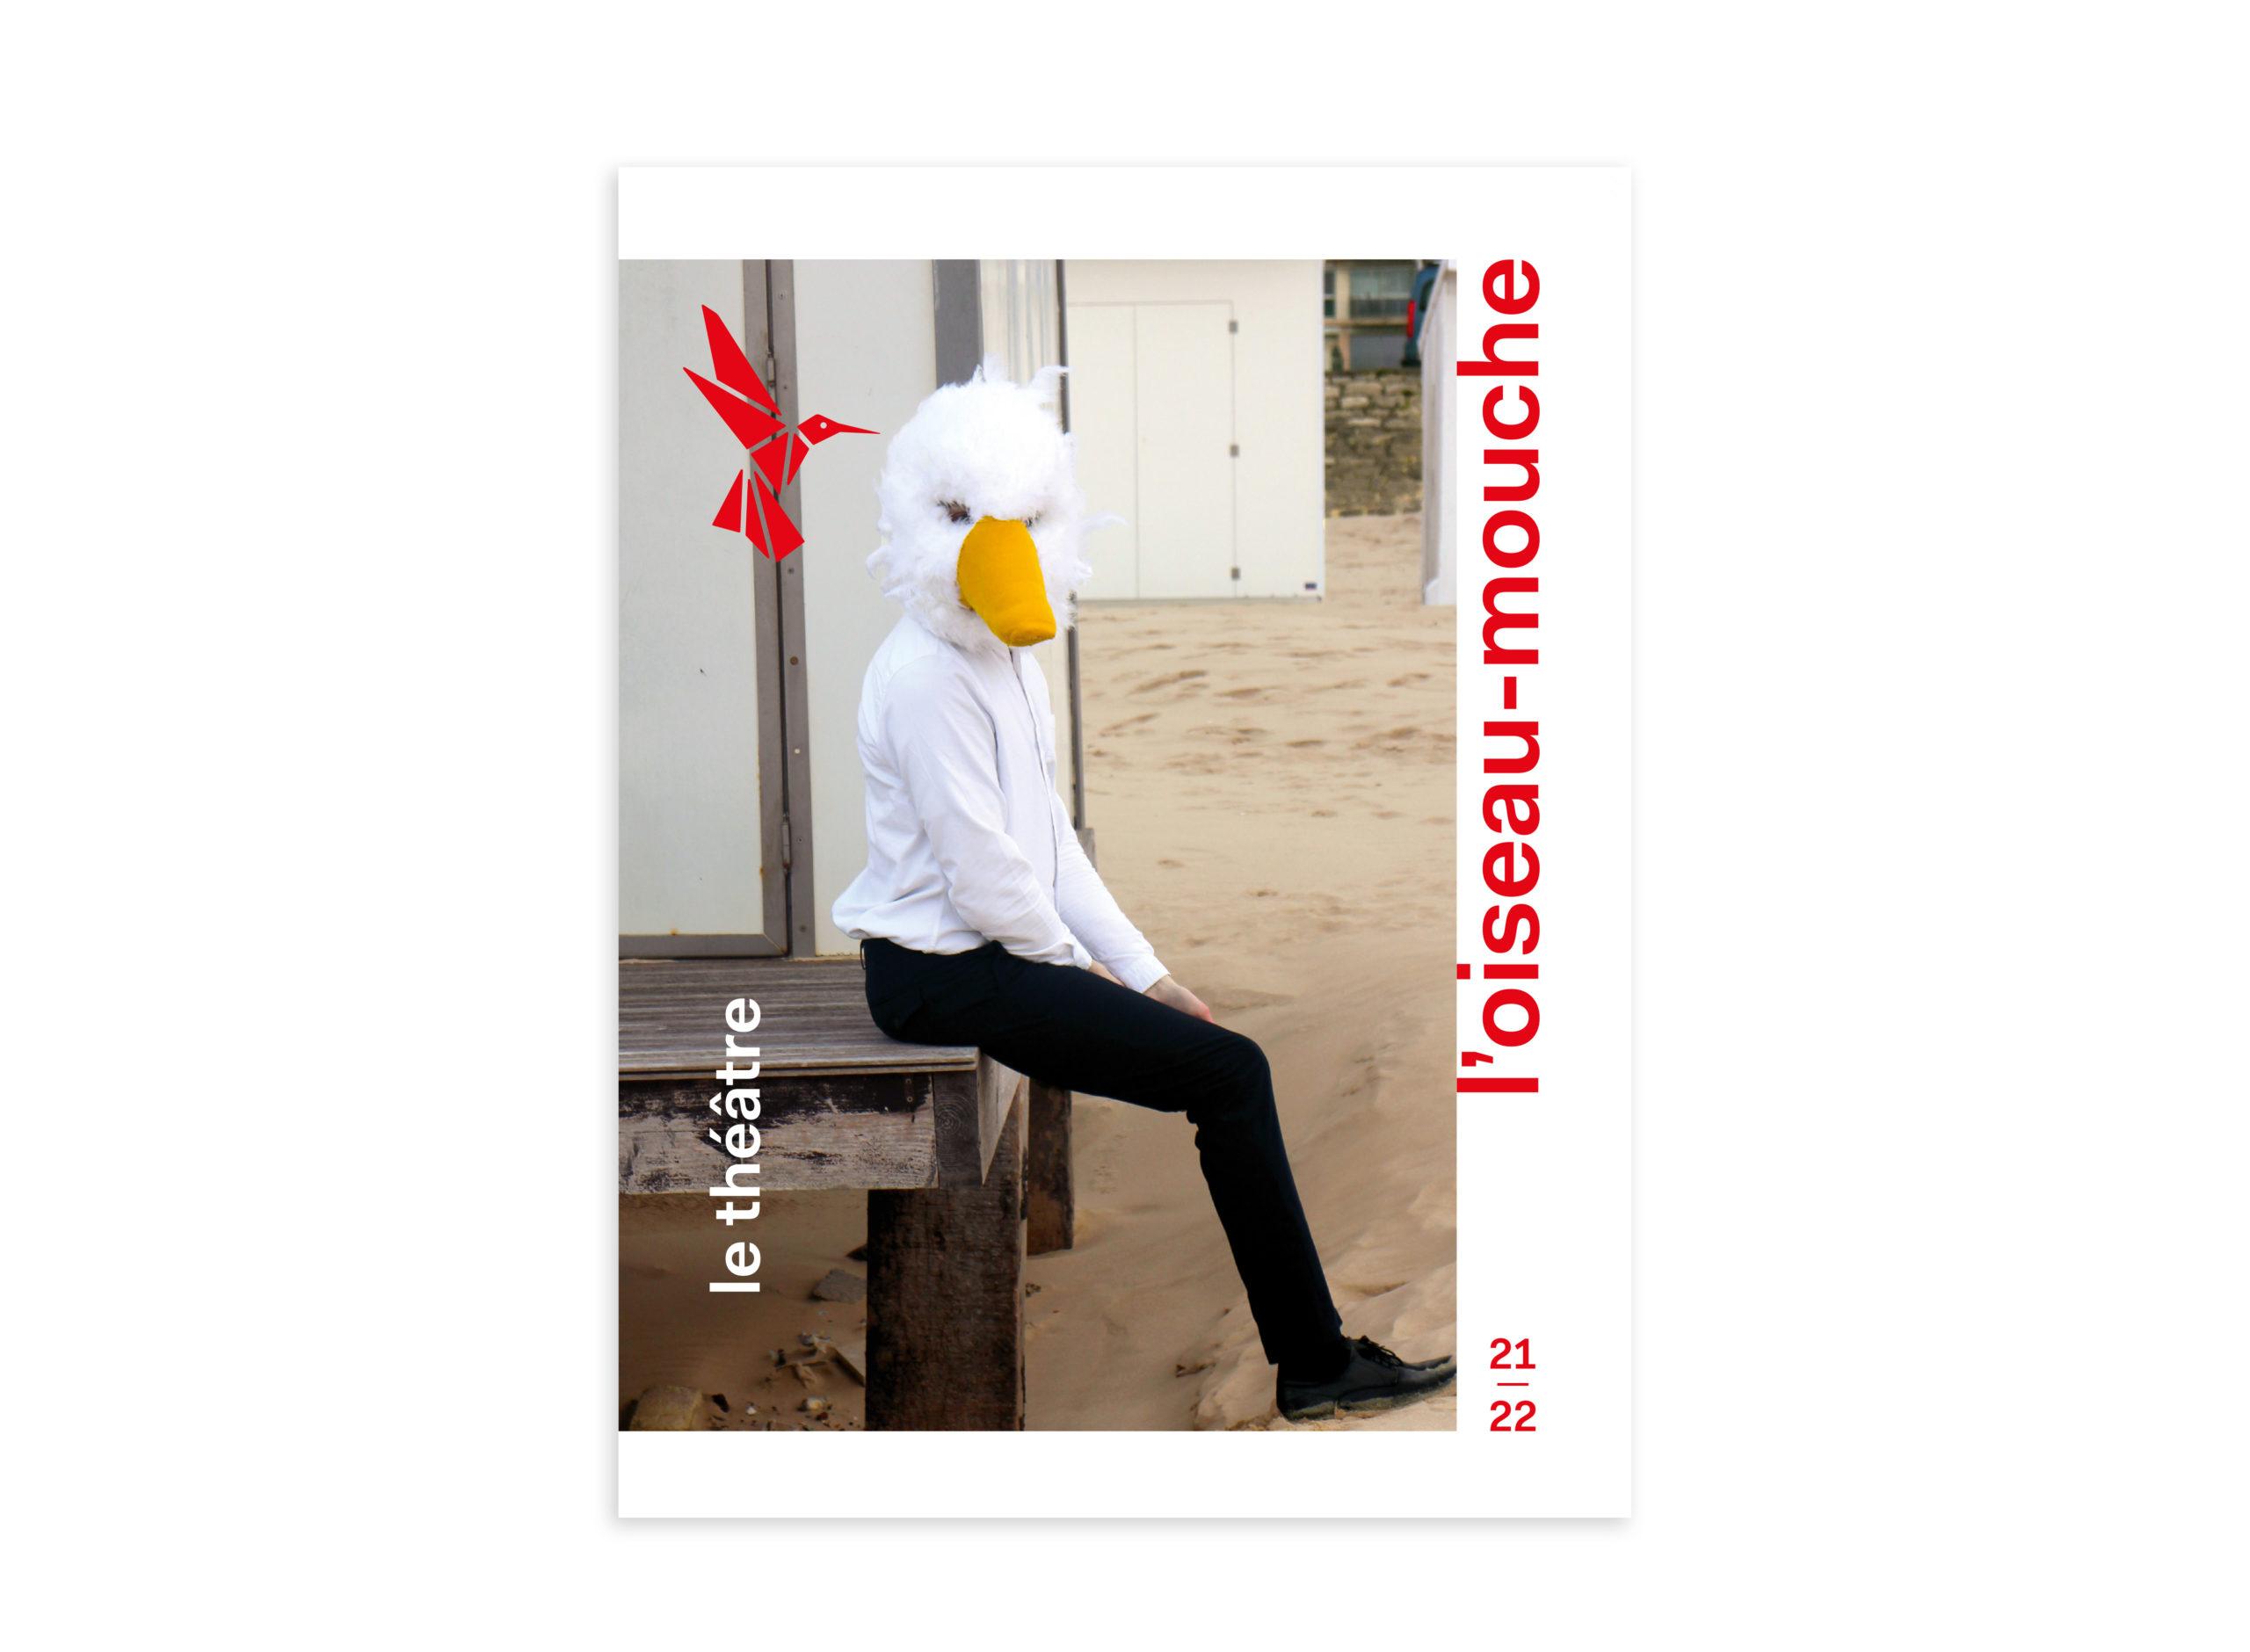 OM SAISON Brochure 21 22 Cover 02